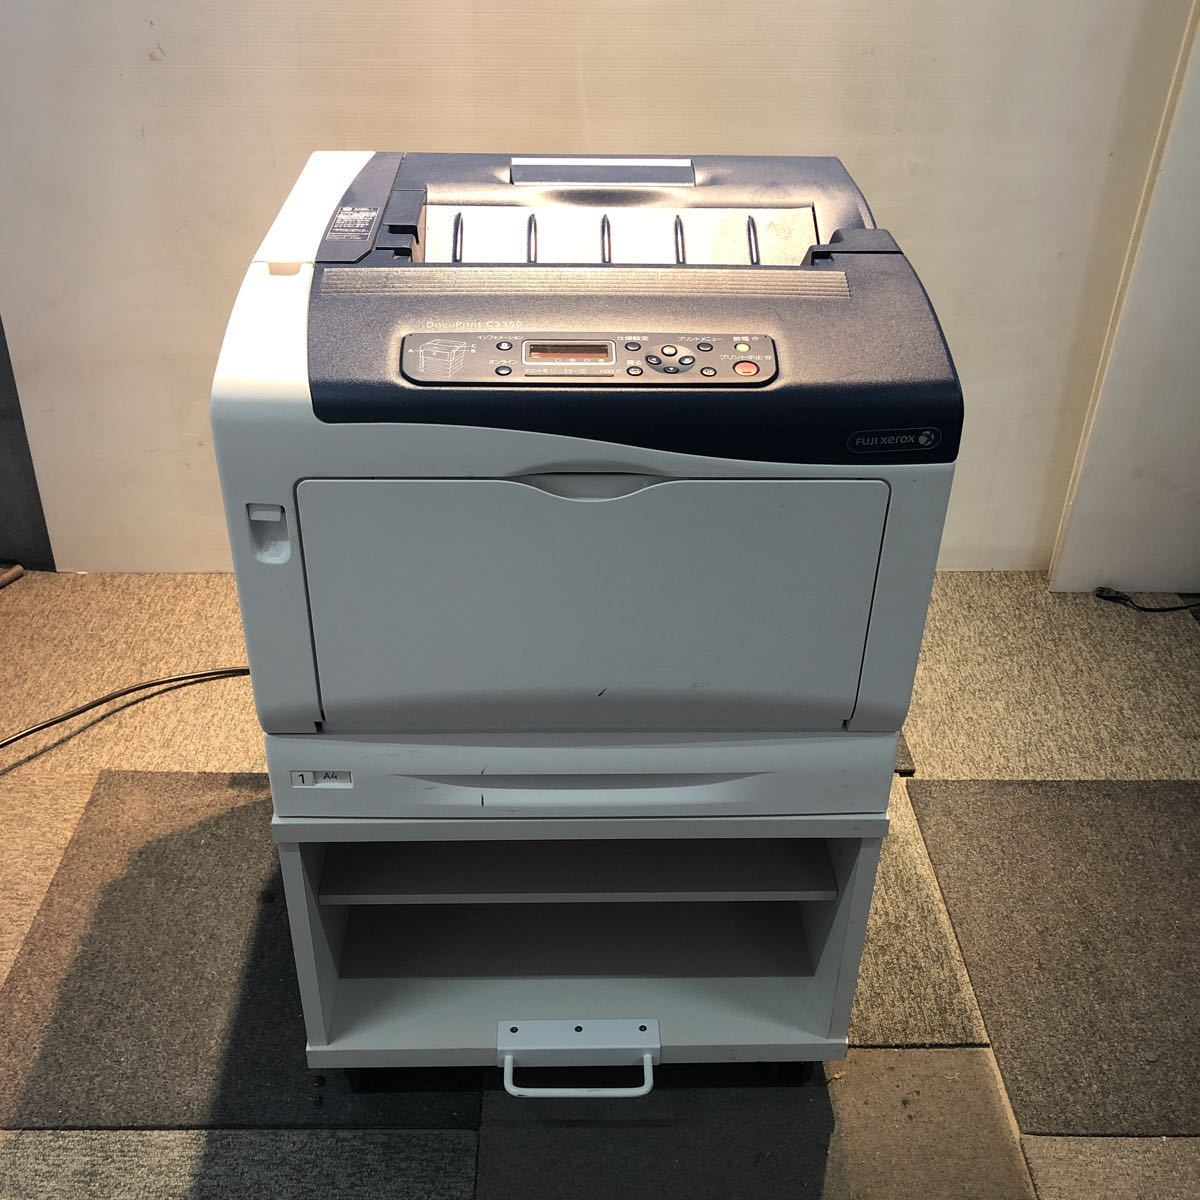 FUJI XEROX 富士ゼロックス A3 カラーレーザー DocuPrint C3350 2段給紙 両面印刷 専用キャスタ台 プリンター コピー機 ファックス_画像1